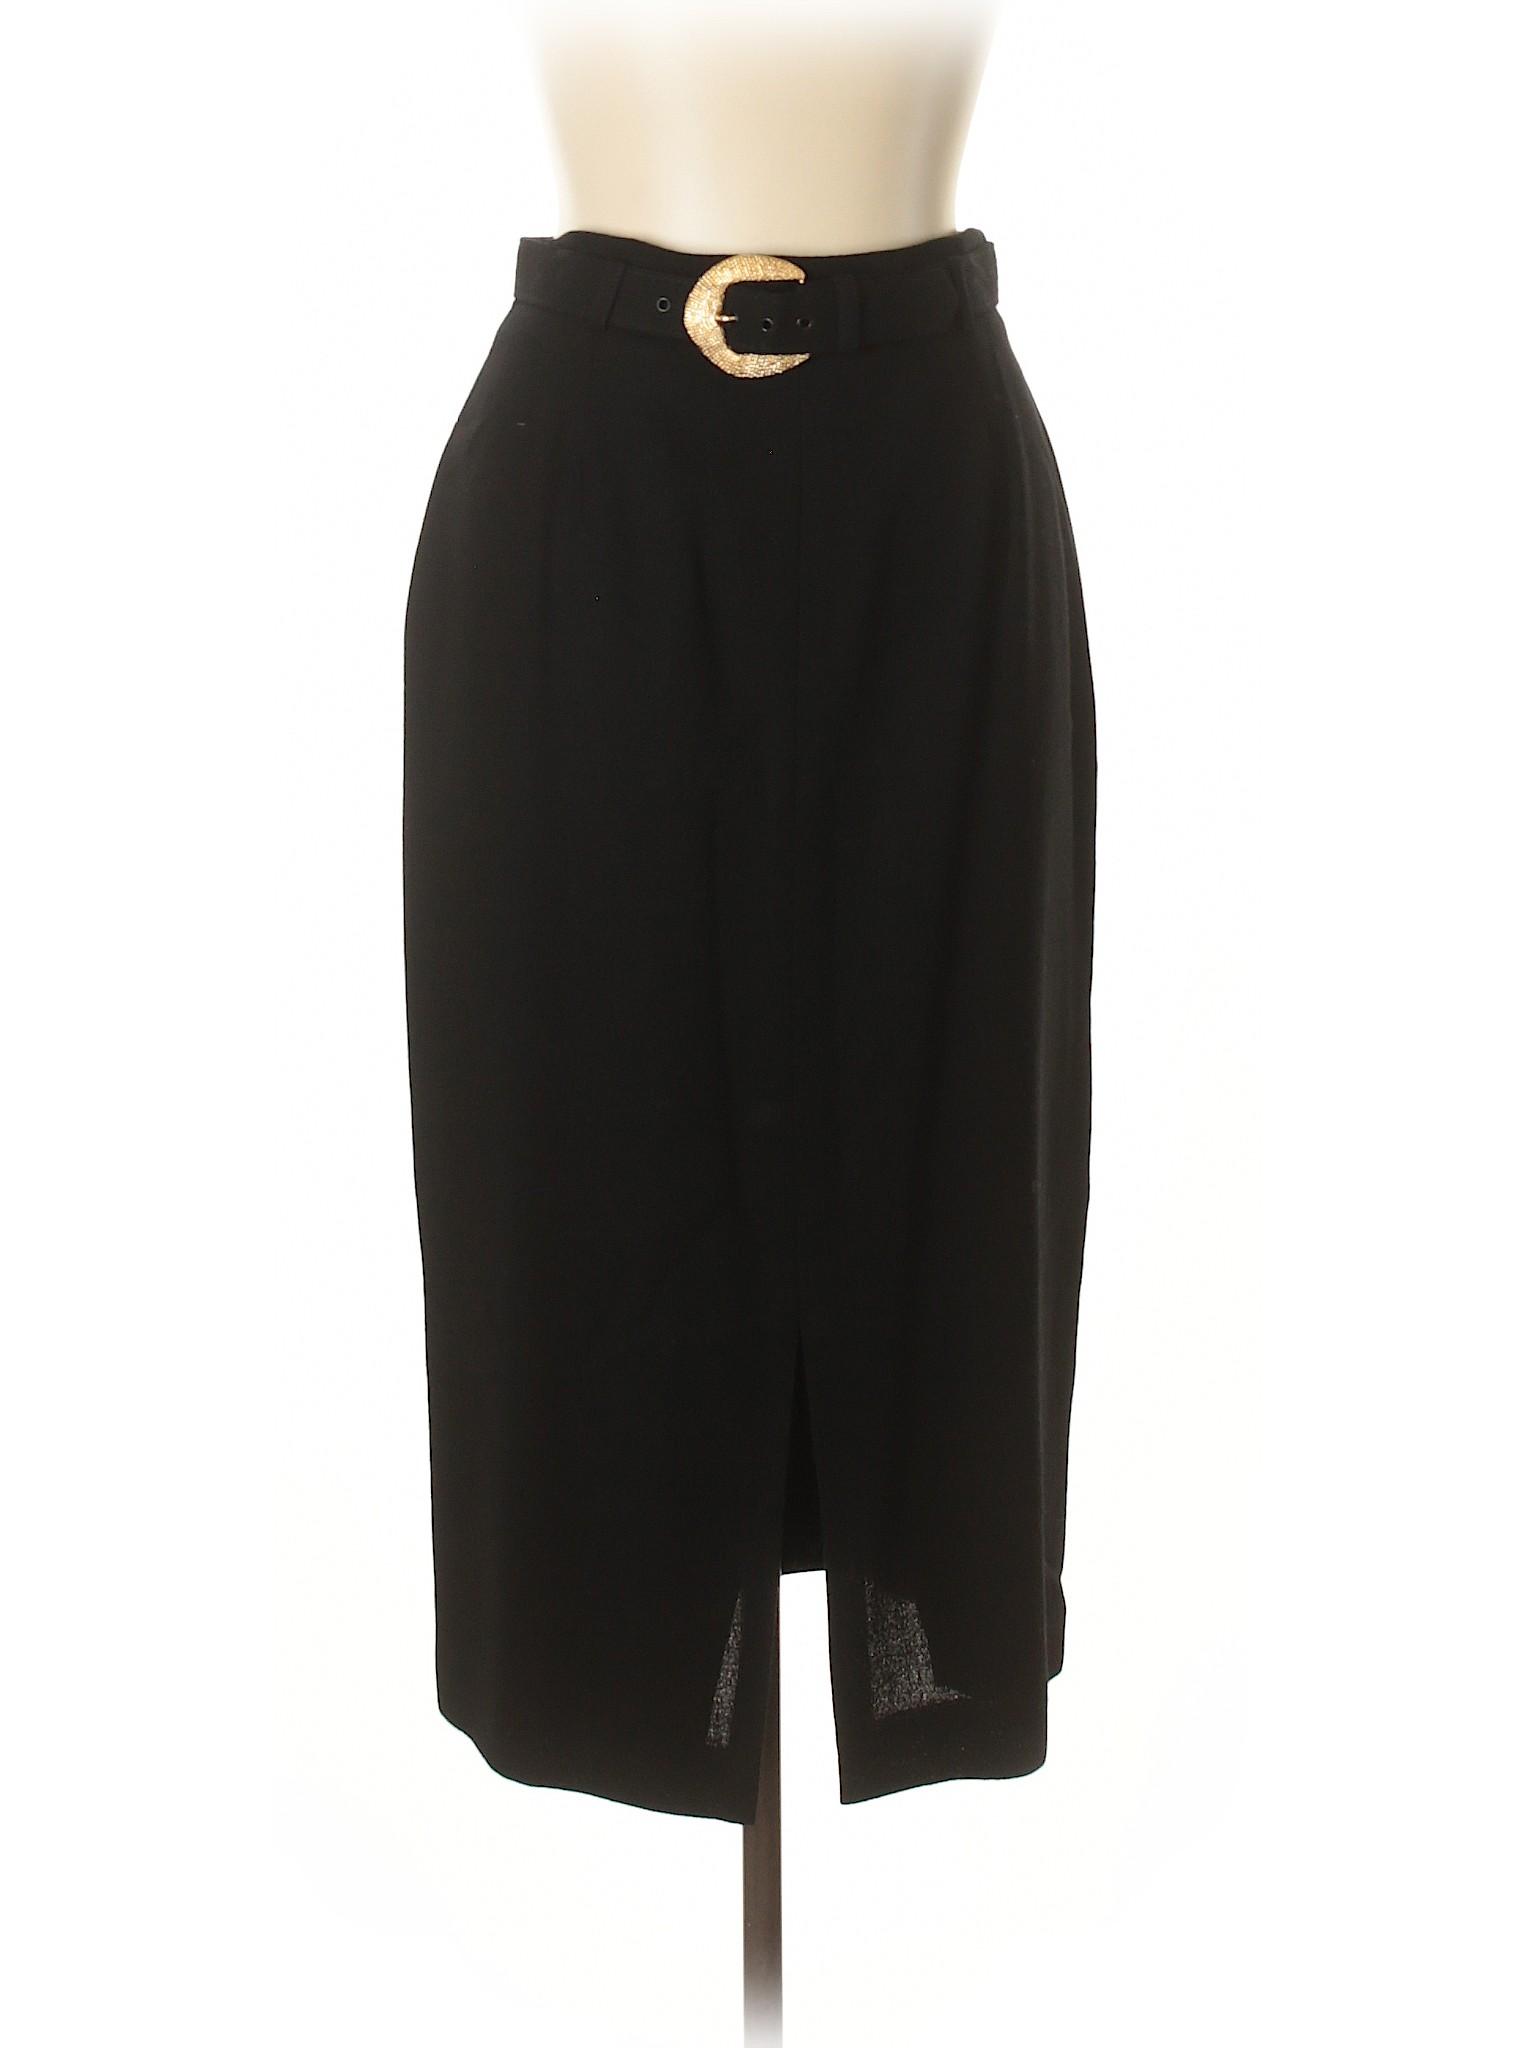 Skirt leisure Evan Picone Wool Boutique SHqIxP8I